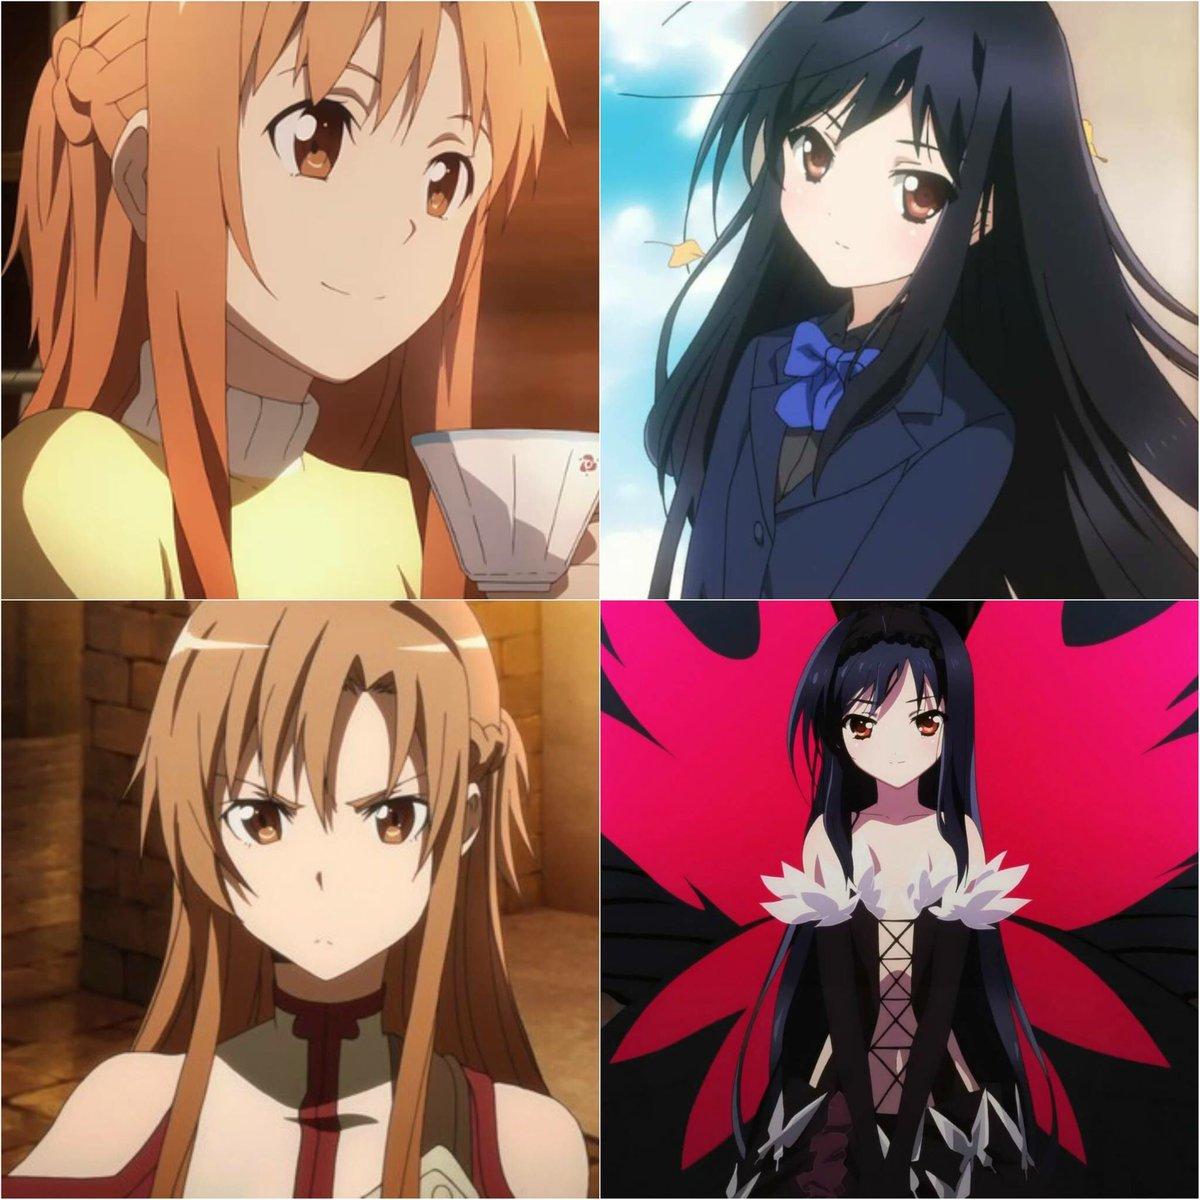 Crunchyroll On Twitter 9 30 Happy Birthday To Asuna Sword Art Online And Kuroyukihime Accel World